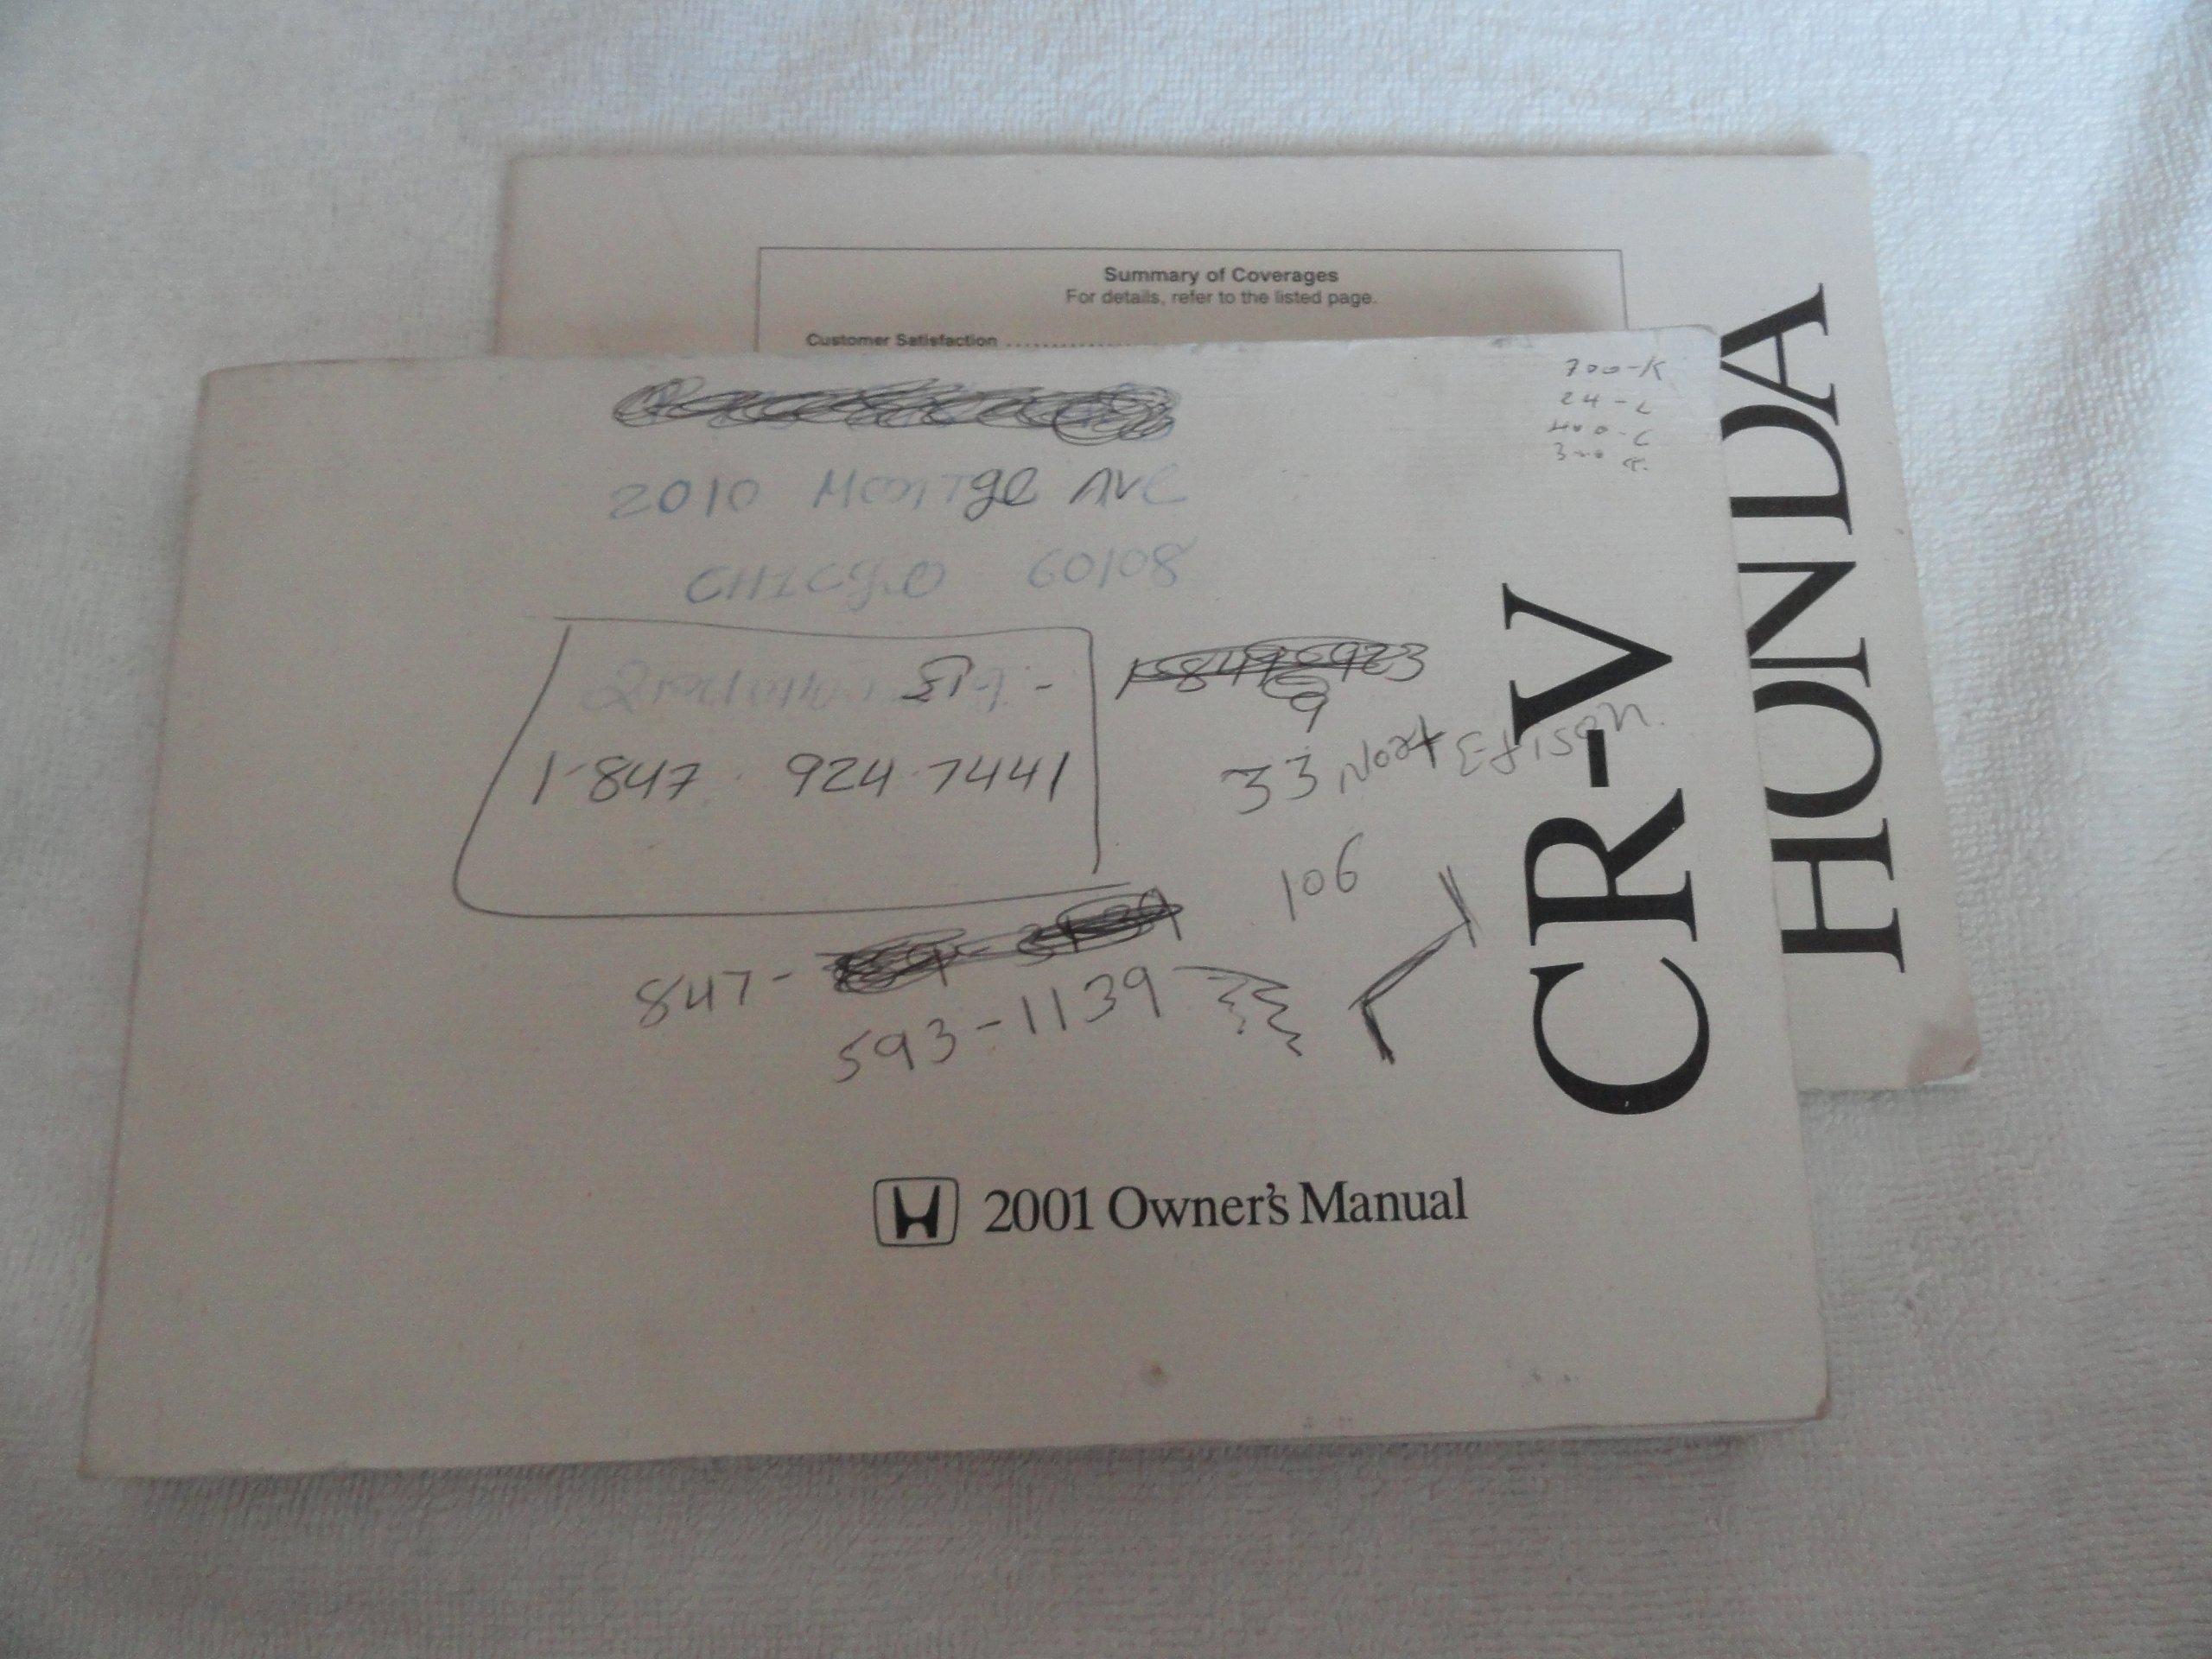 2001 honda crv cr v owners manual honda amazon com books rh amazon com 2001 honda crv owners manual pdf 2001 honda cr v owners manual